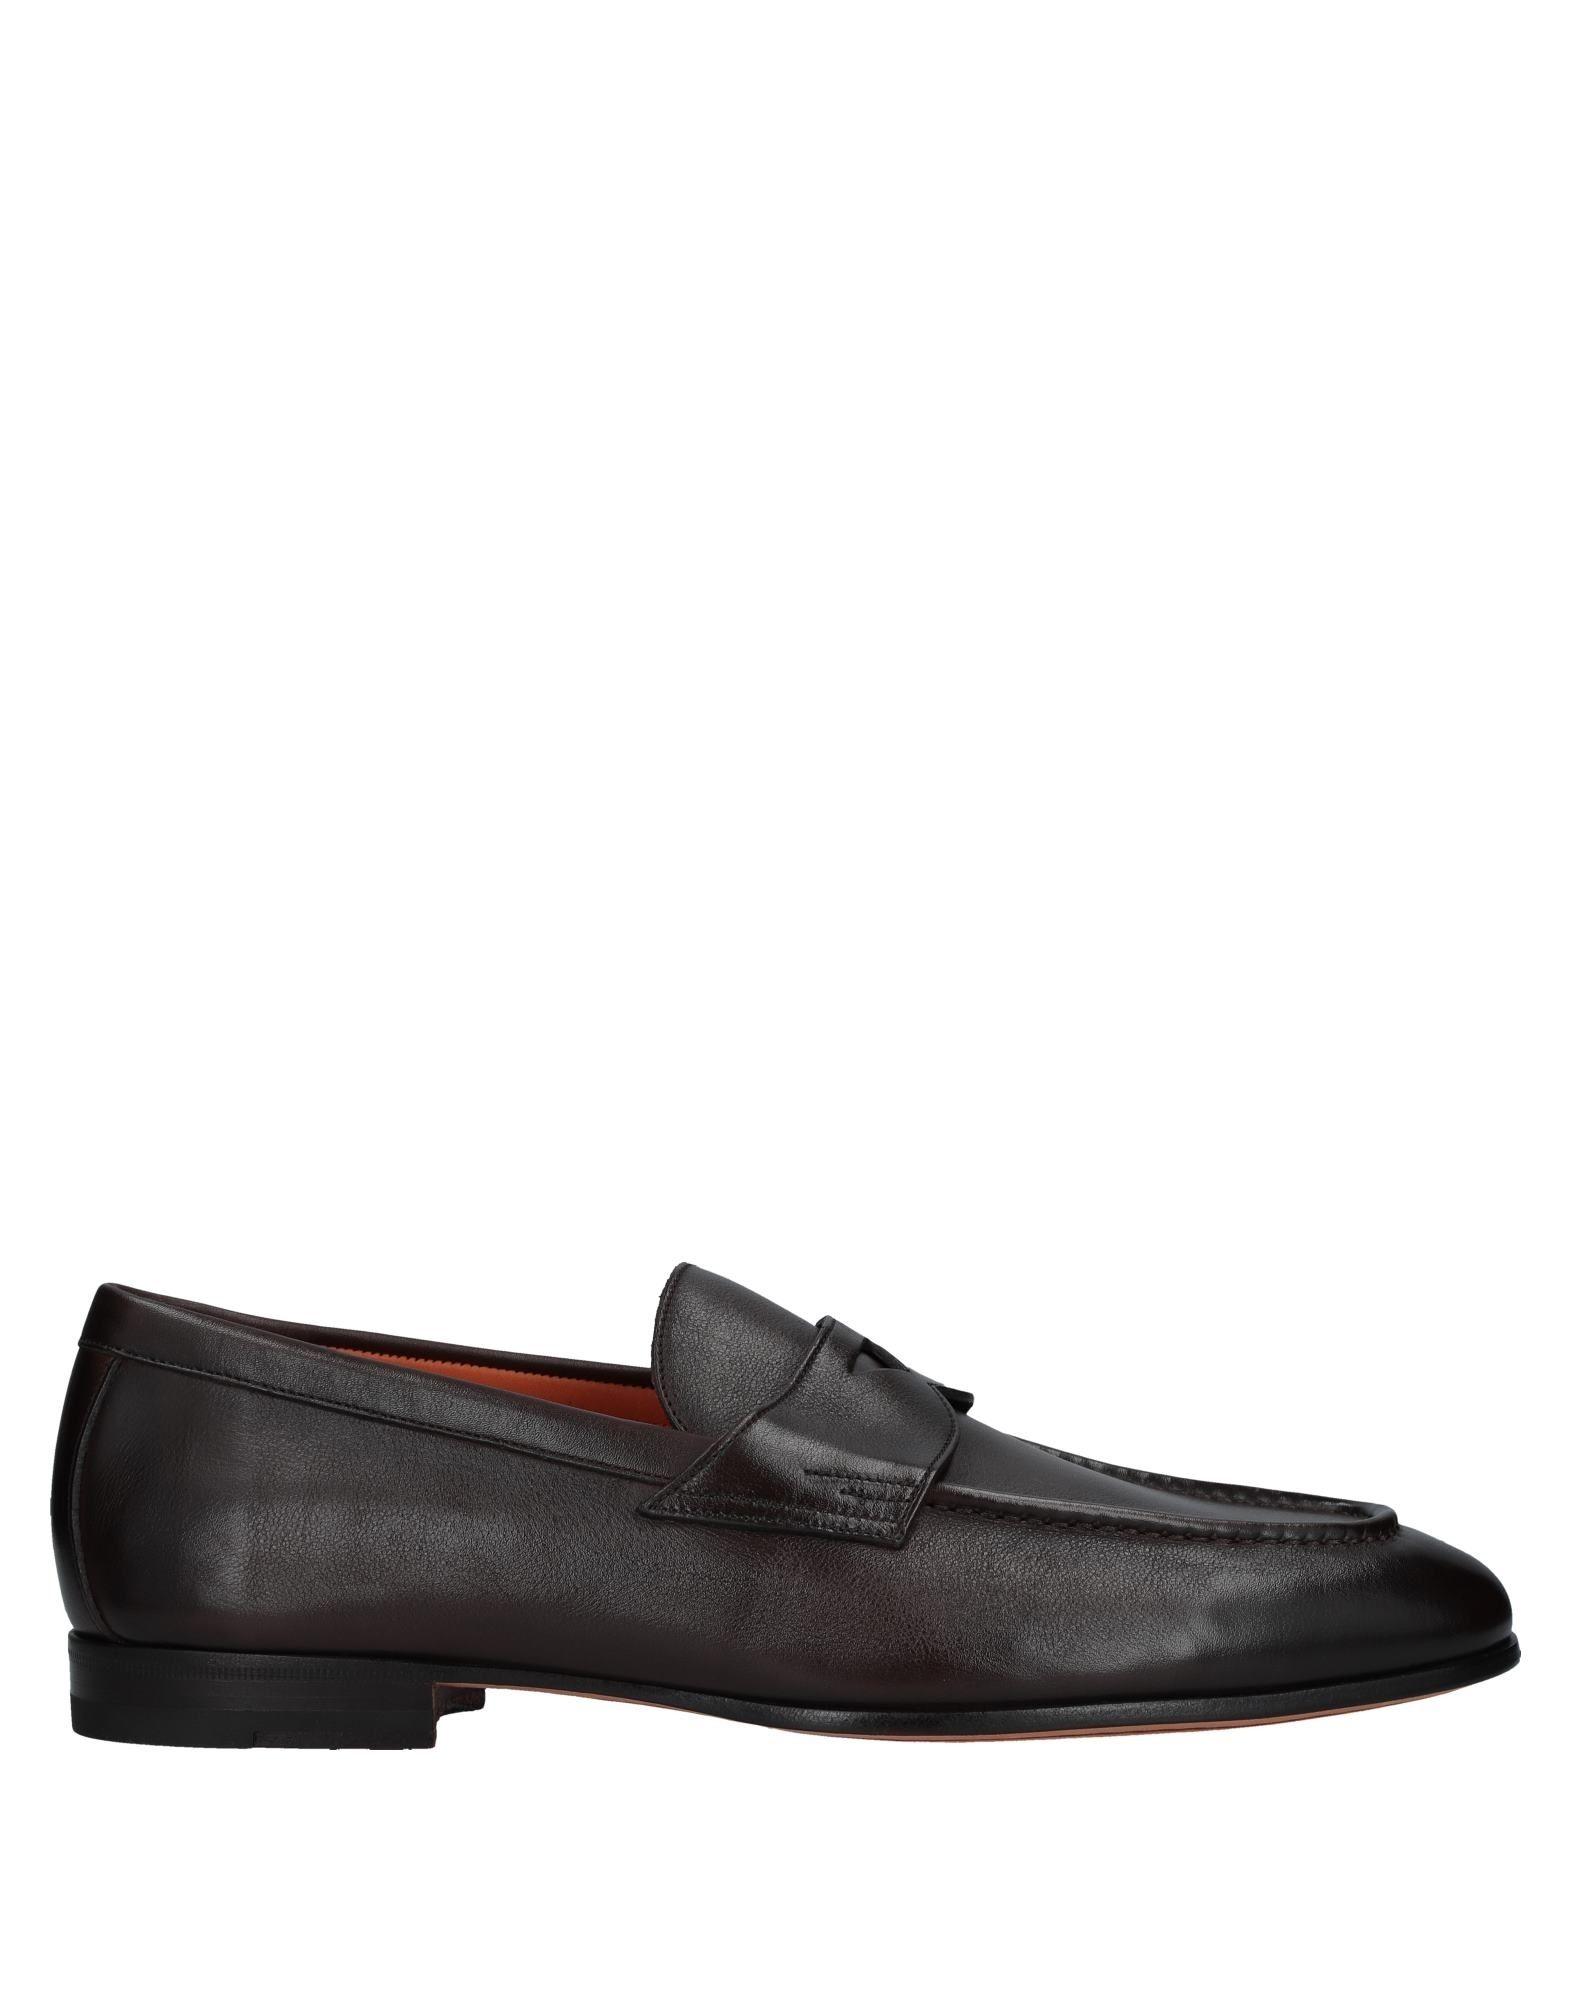 Santoni Mokassins Herren  11410283MN Gute Qualität beliebte Schuhe